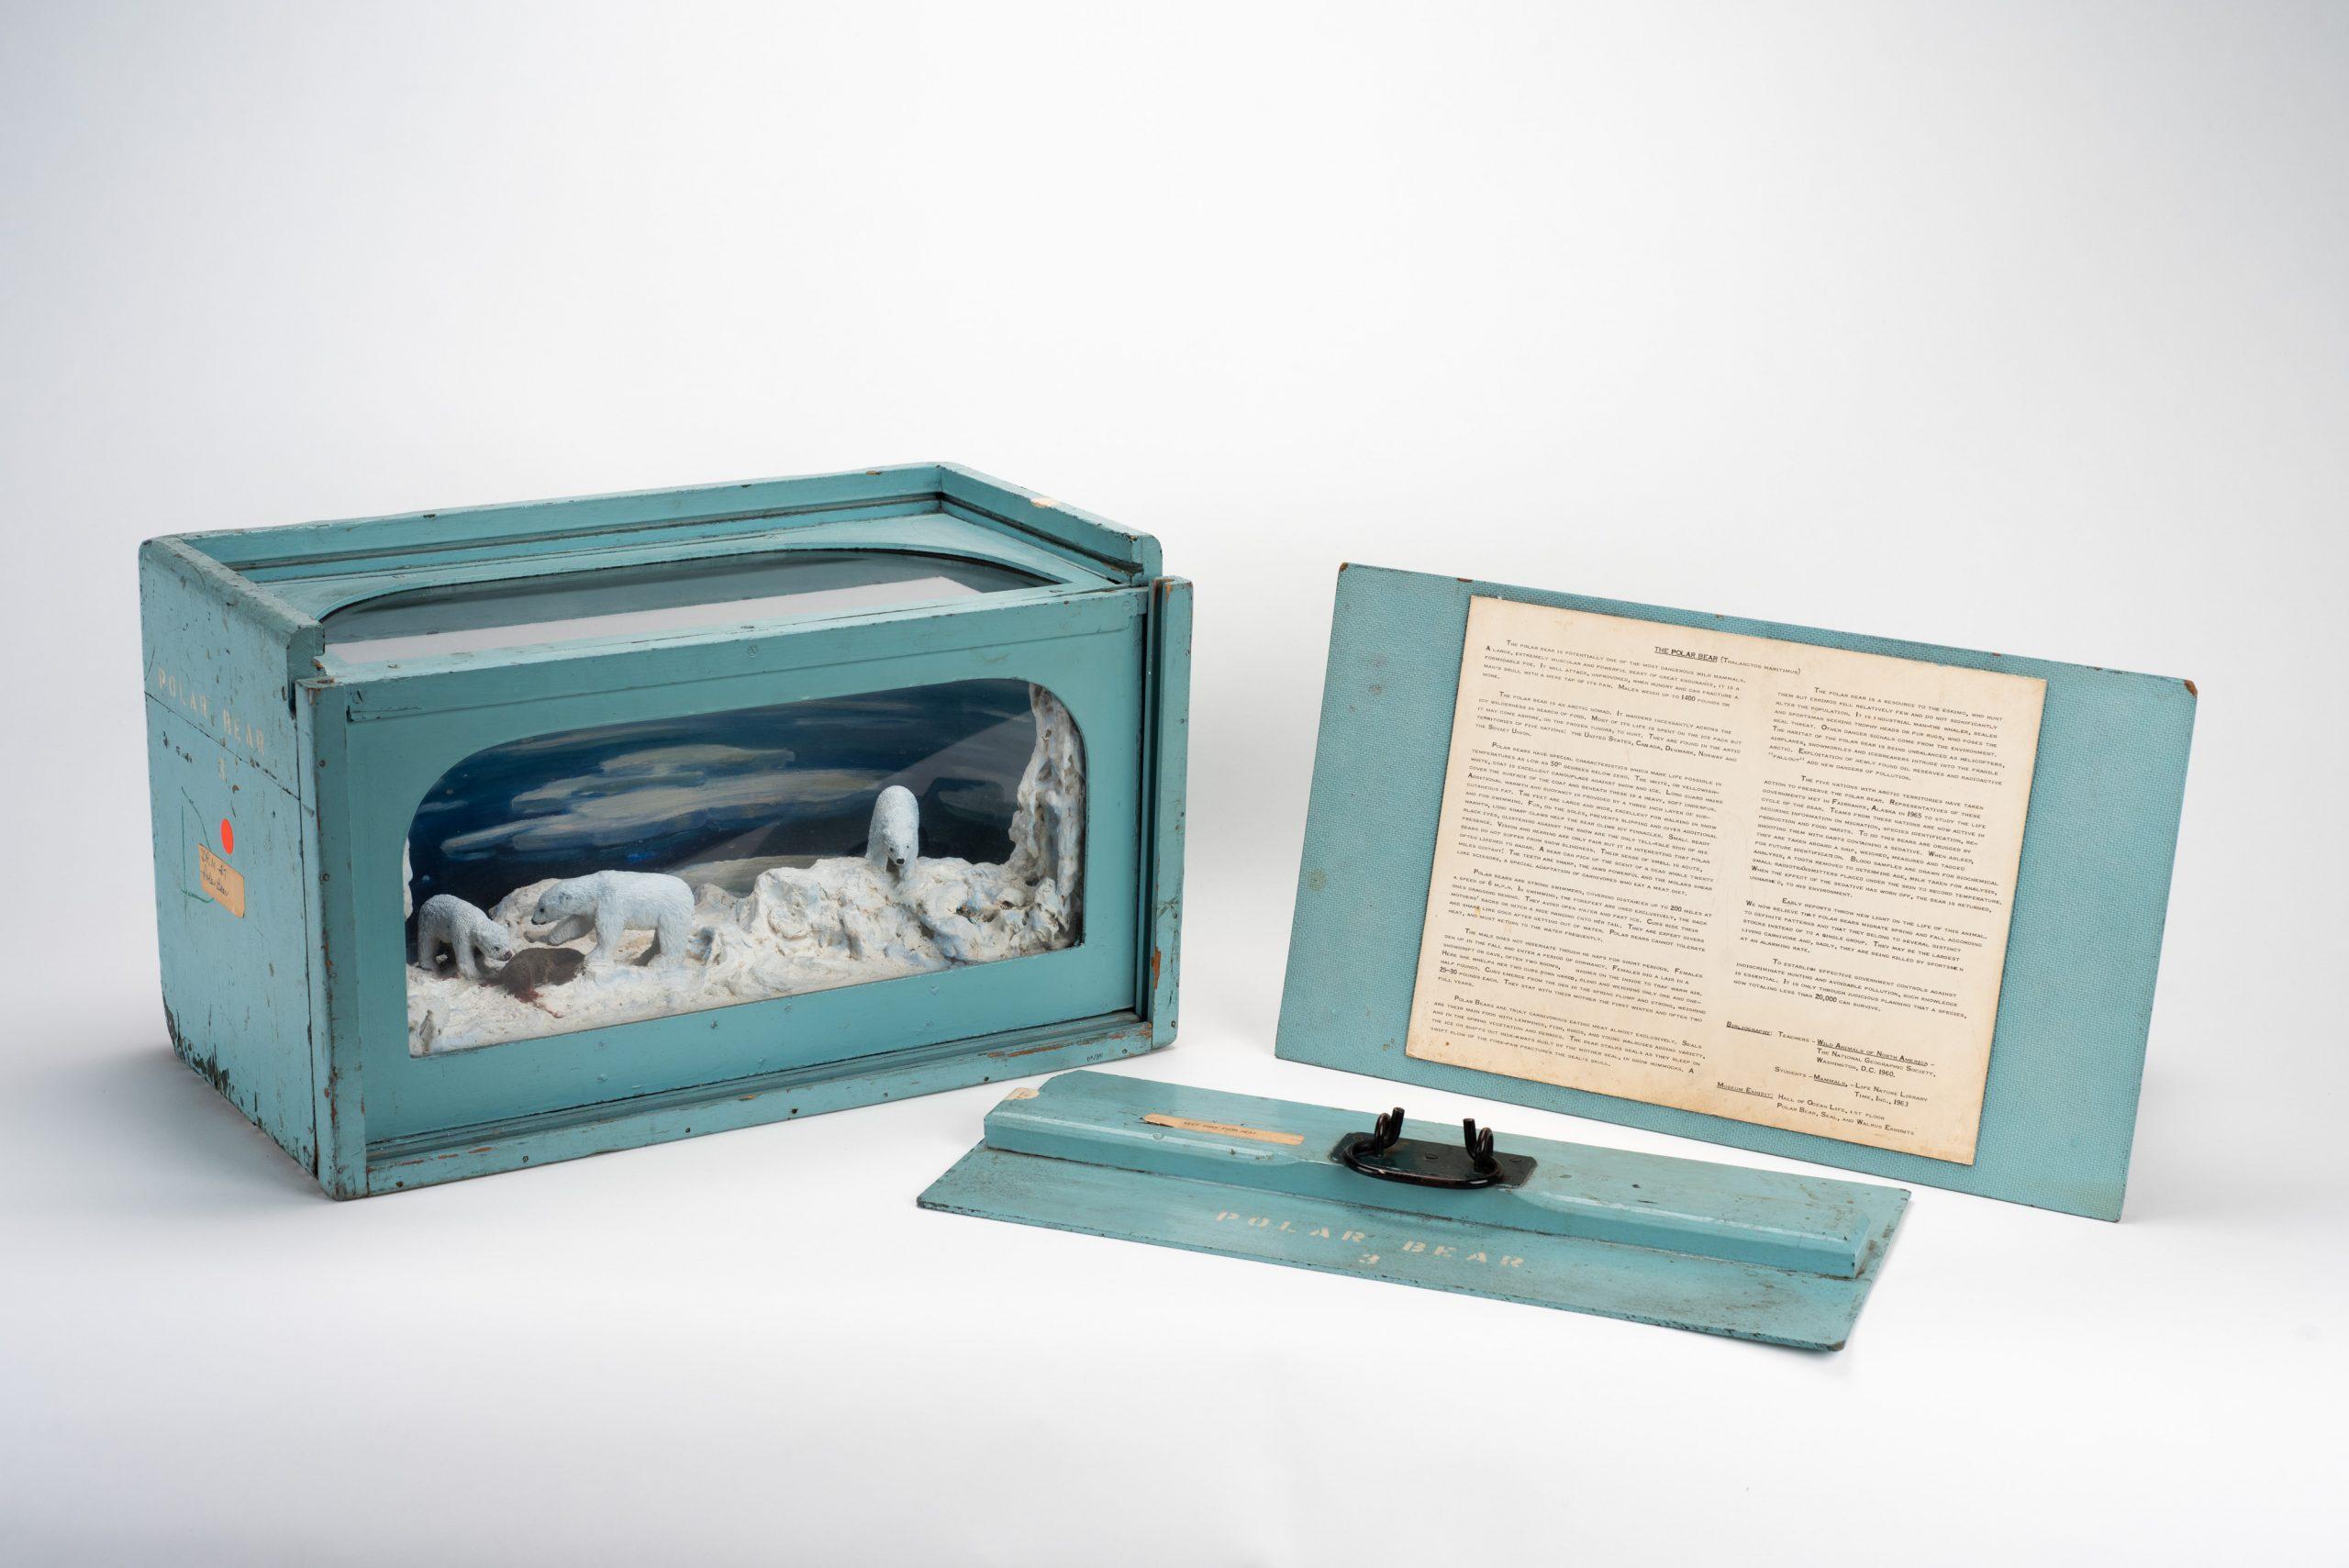 Polar Bear Educational Diorama with lid and card